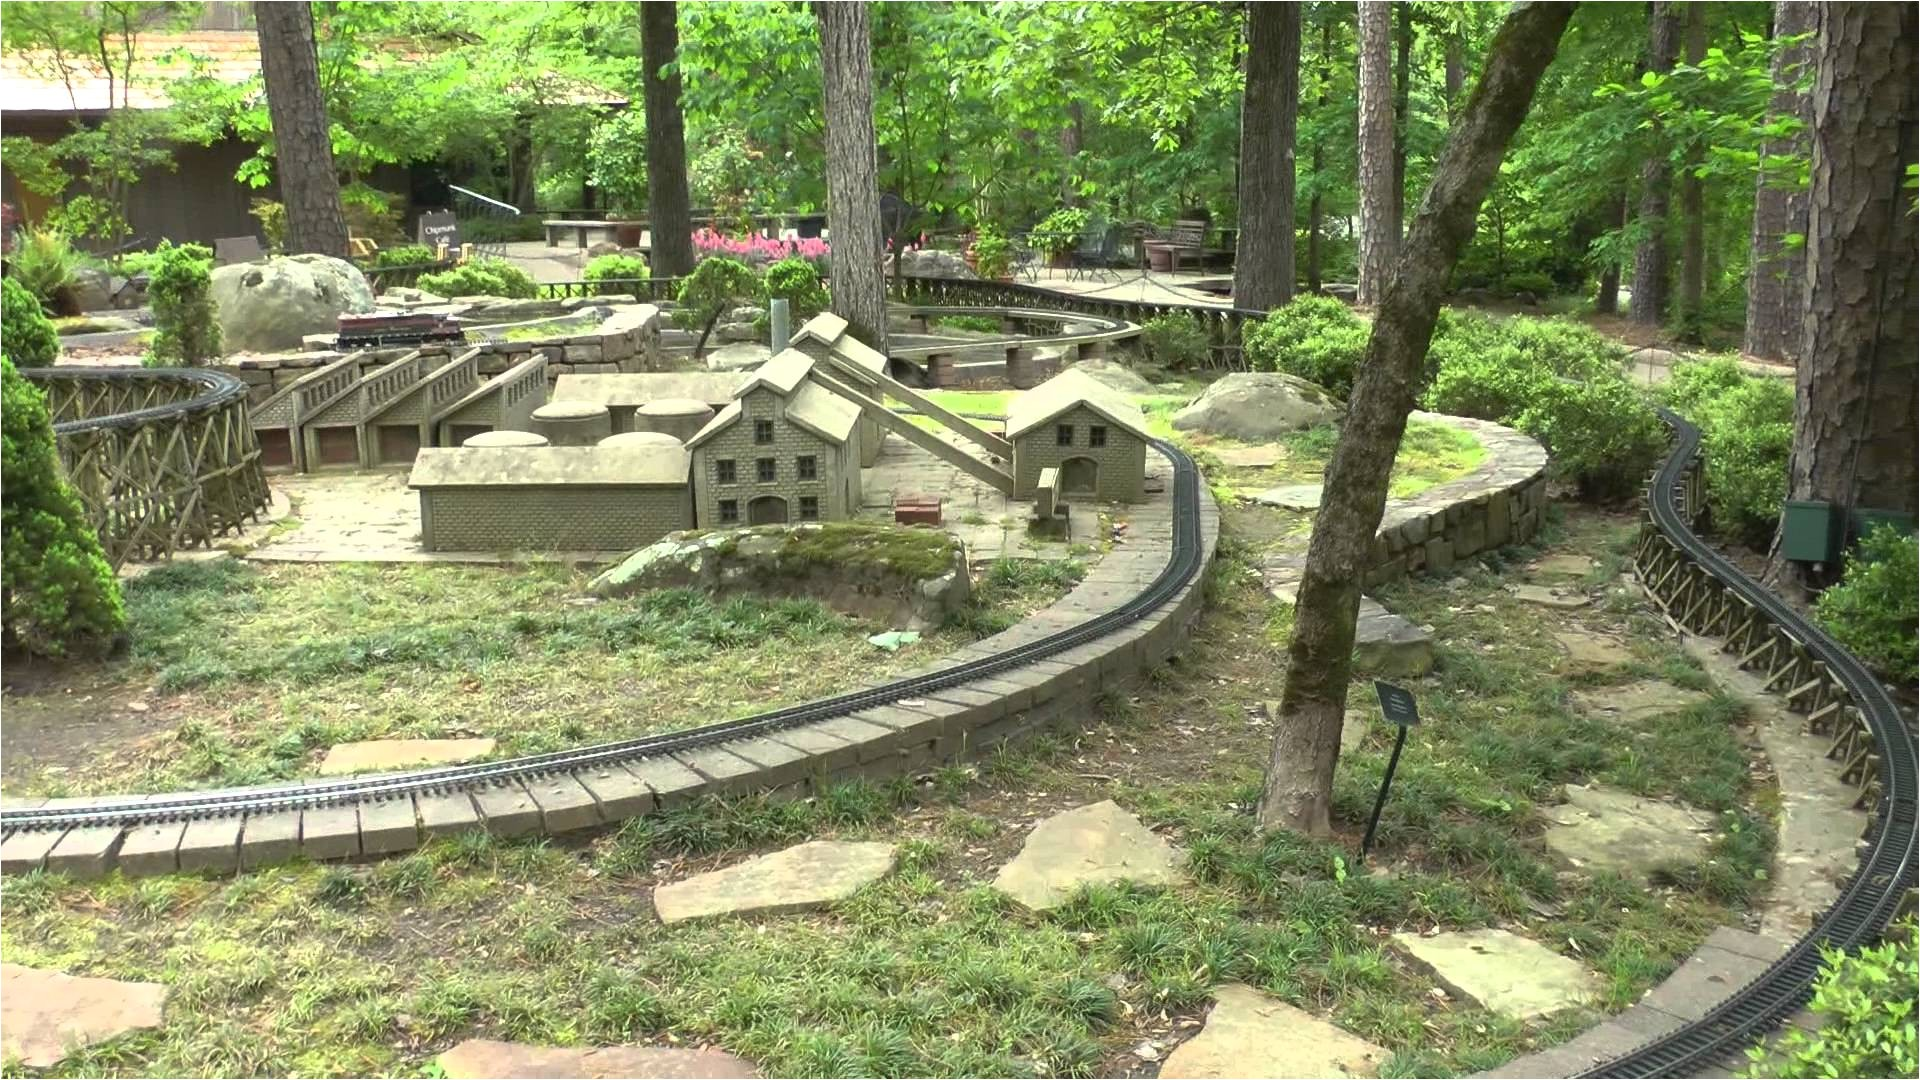 Garden Trains Garden Trains at Garvan Woodland Gardens Hot Springs Arkansas Youtube